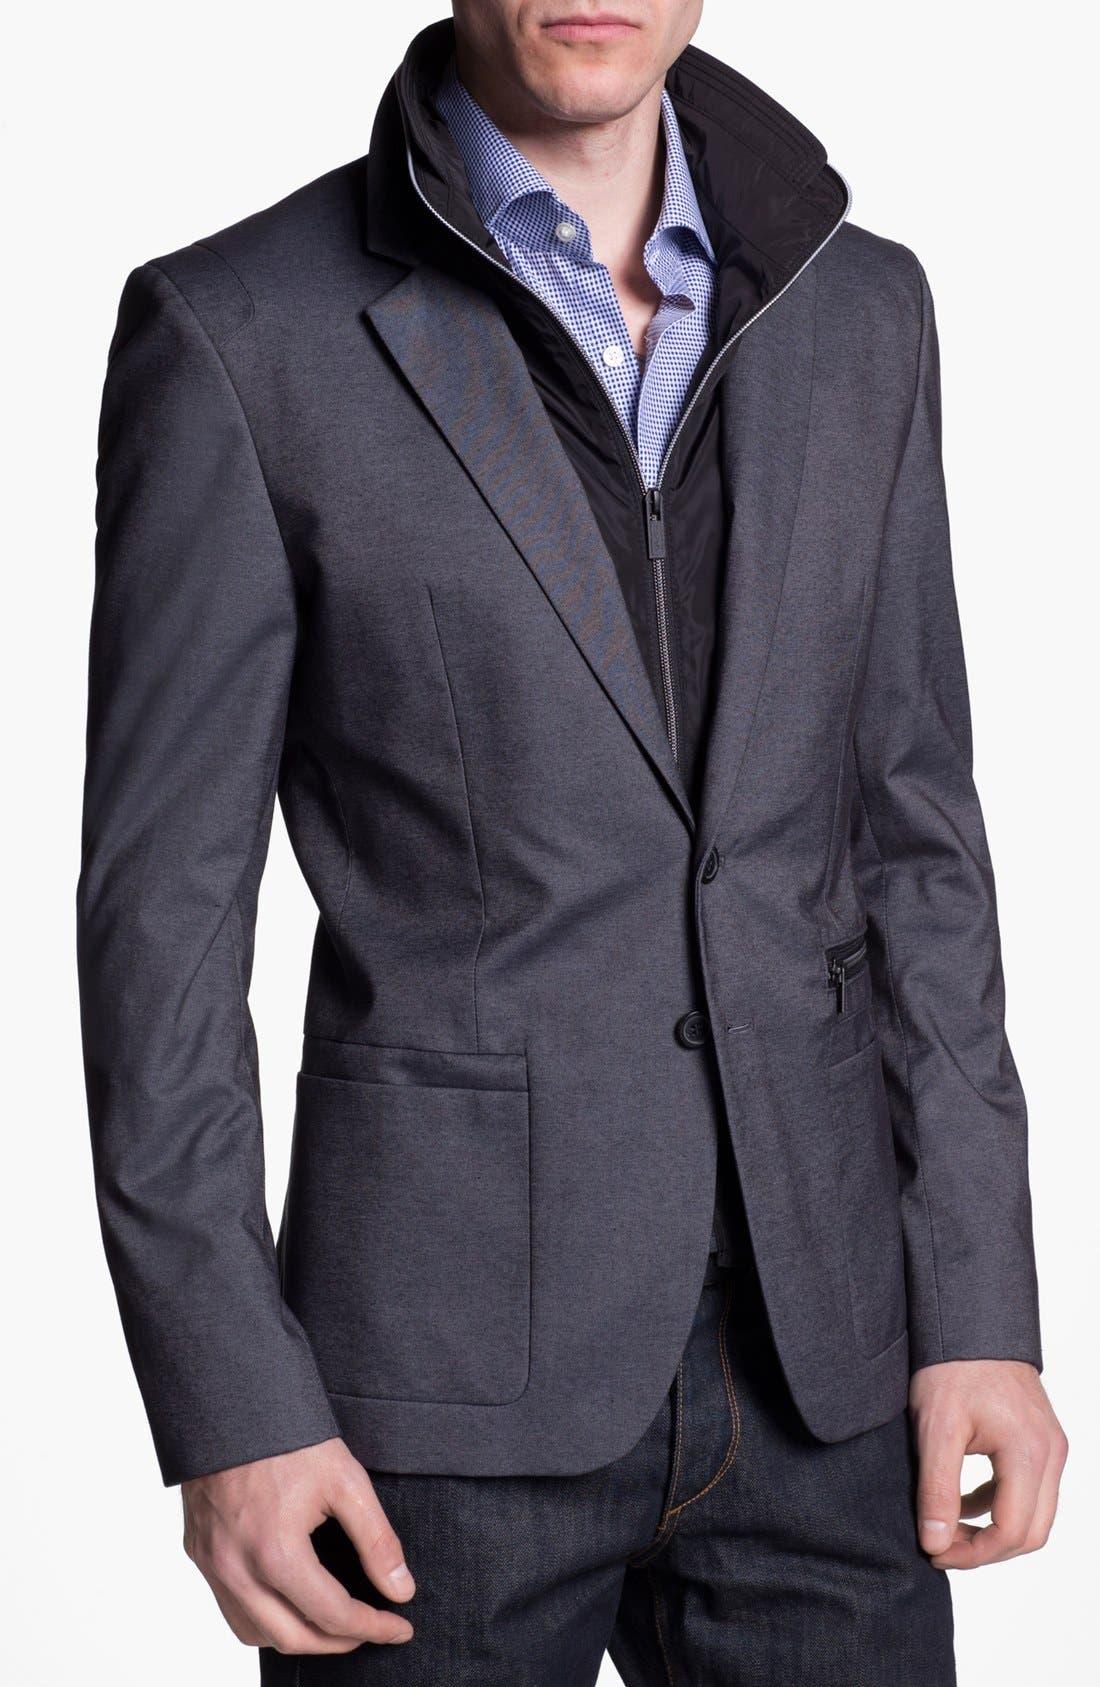 Alternate Image 1 Selected - HUGO 'Alinos' Extra Trim Fit Sportcoat